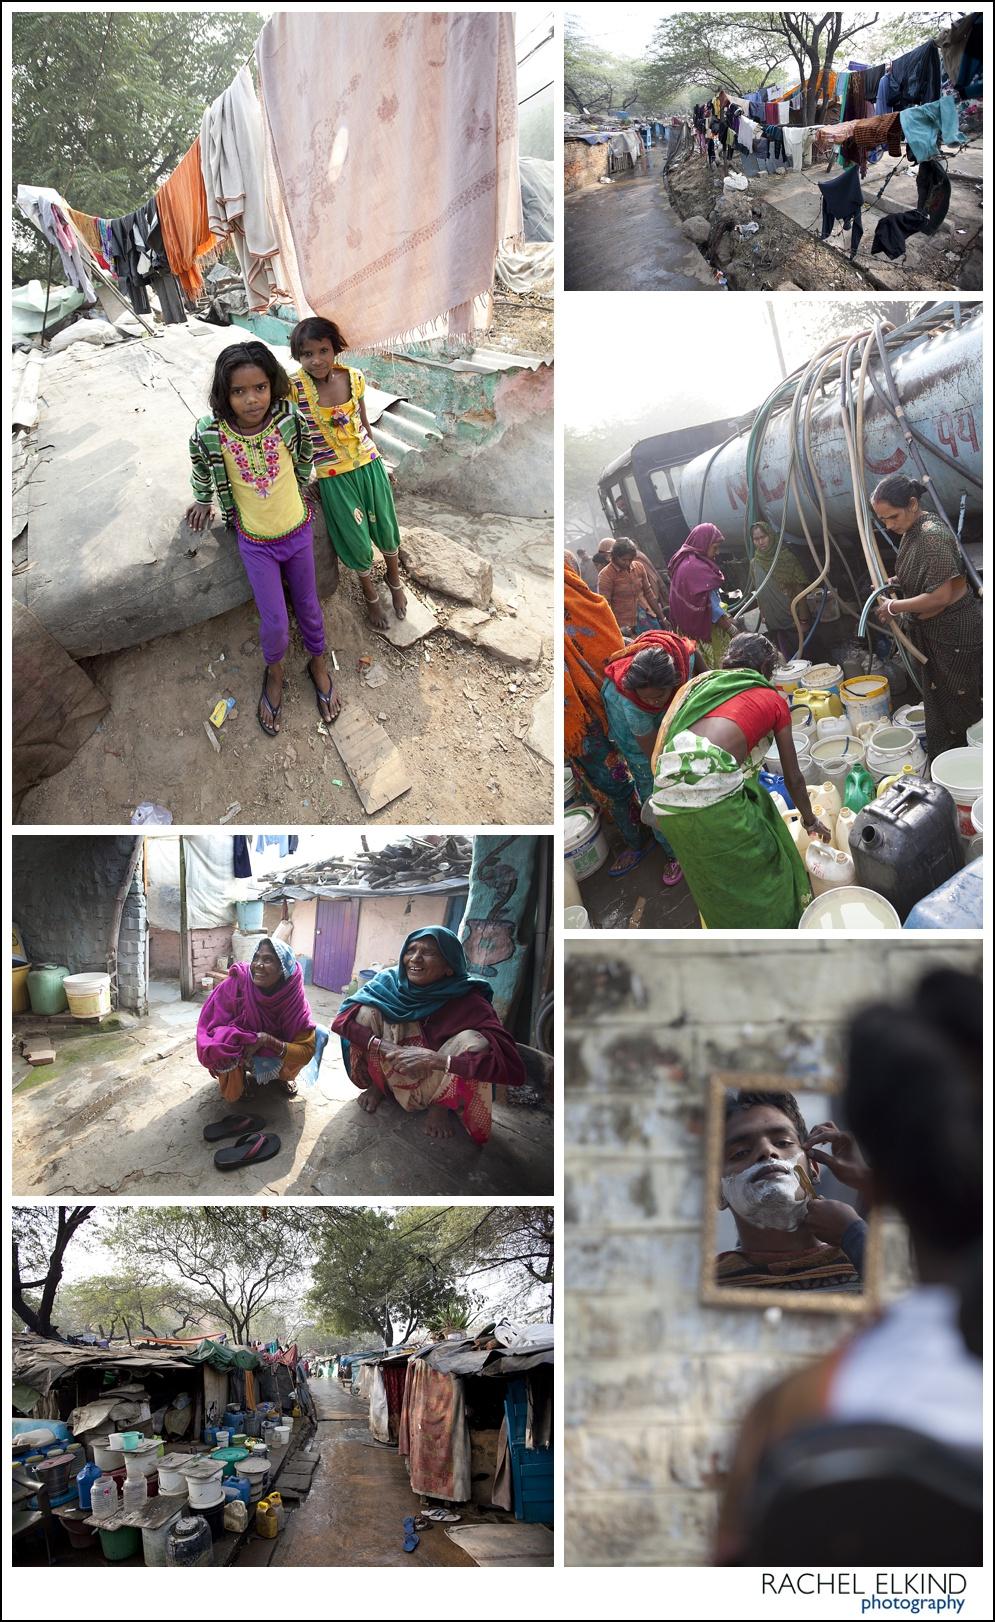 rachel_elkind_delhi_slum_india_04